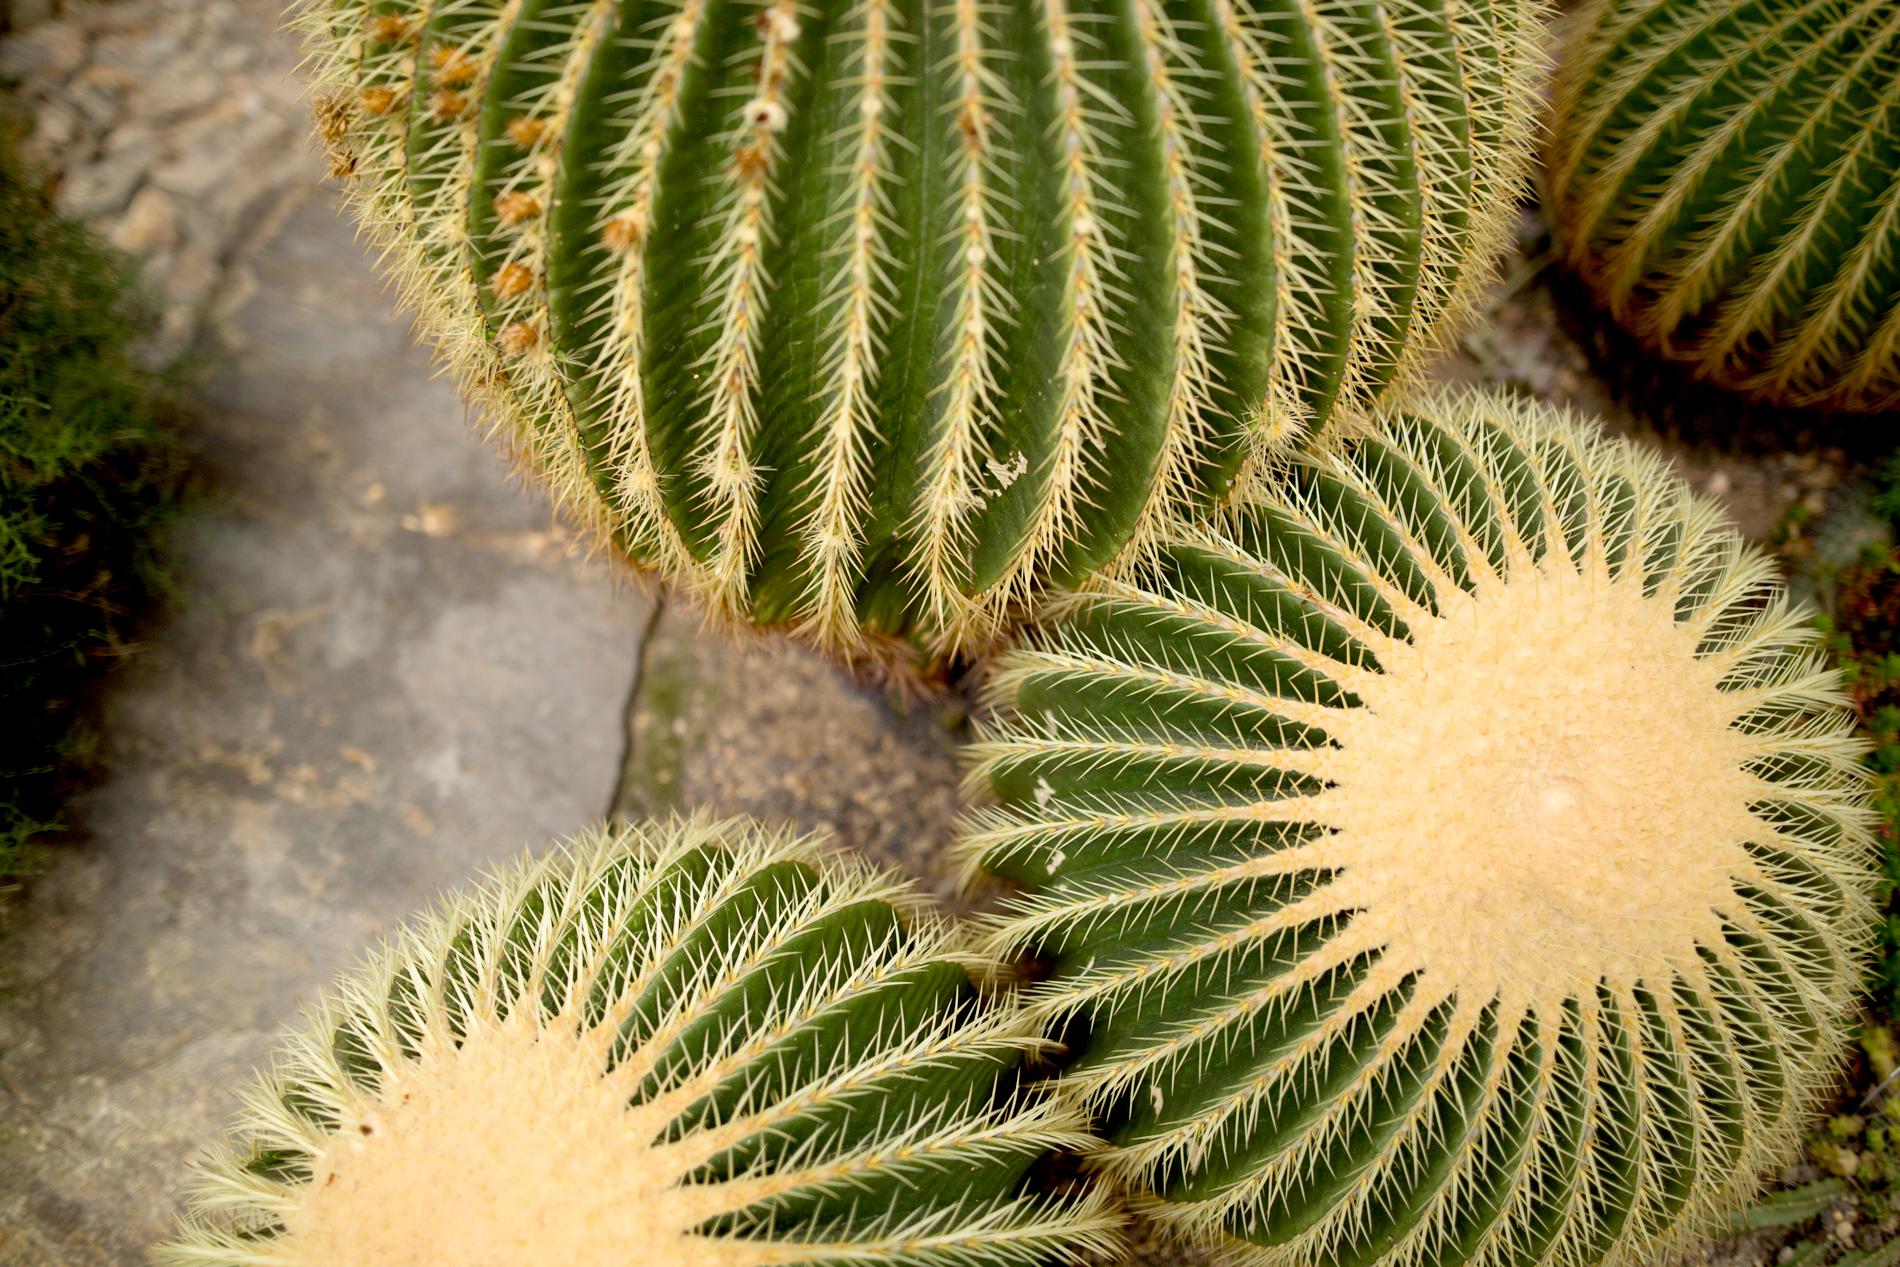 cactus cacti botanical garden berlin a.p.c. halfmoon bag saint laurent espadrilles wedges hm silk shirt silver watch rosefield ootd outfit fashionblogger ricarda schernus cats & dogs modeblog 7